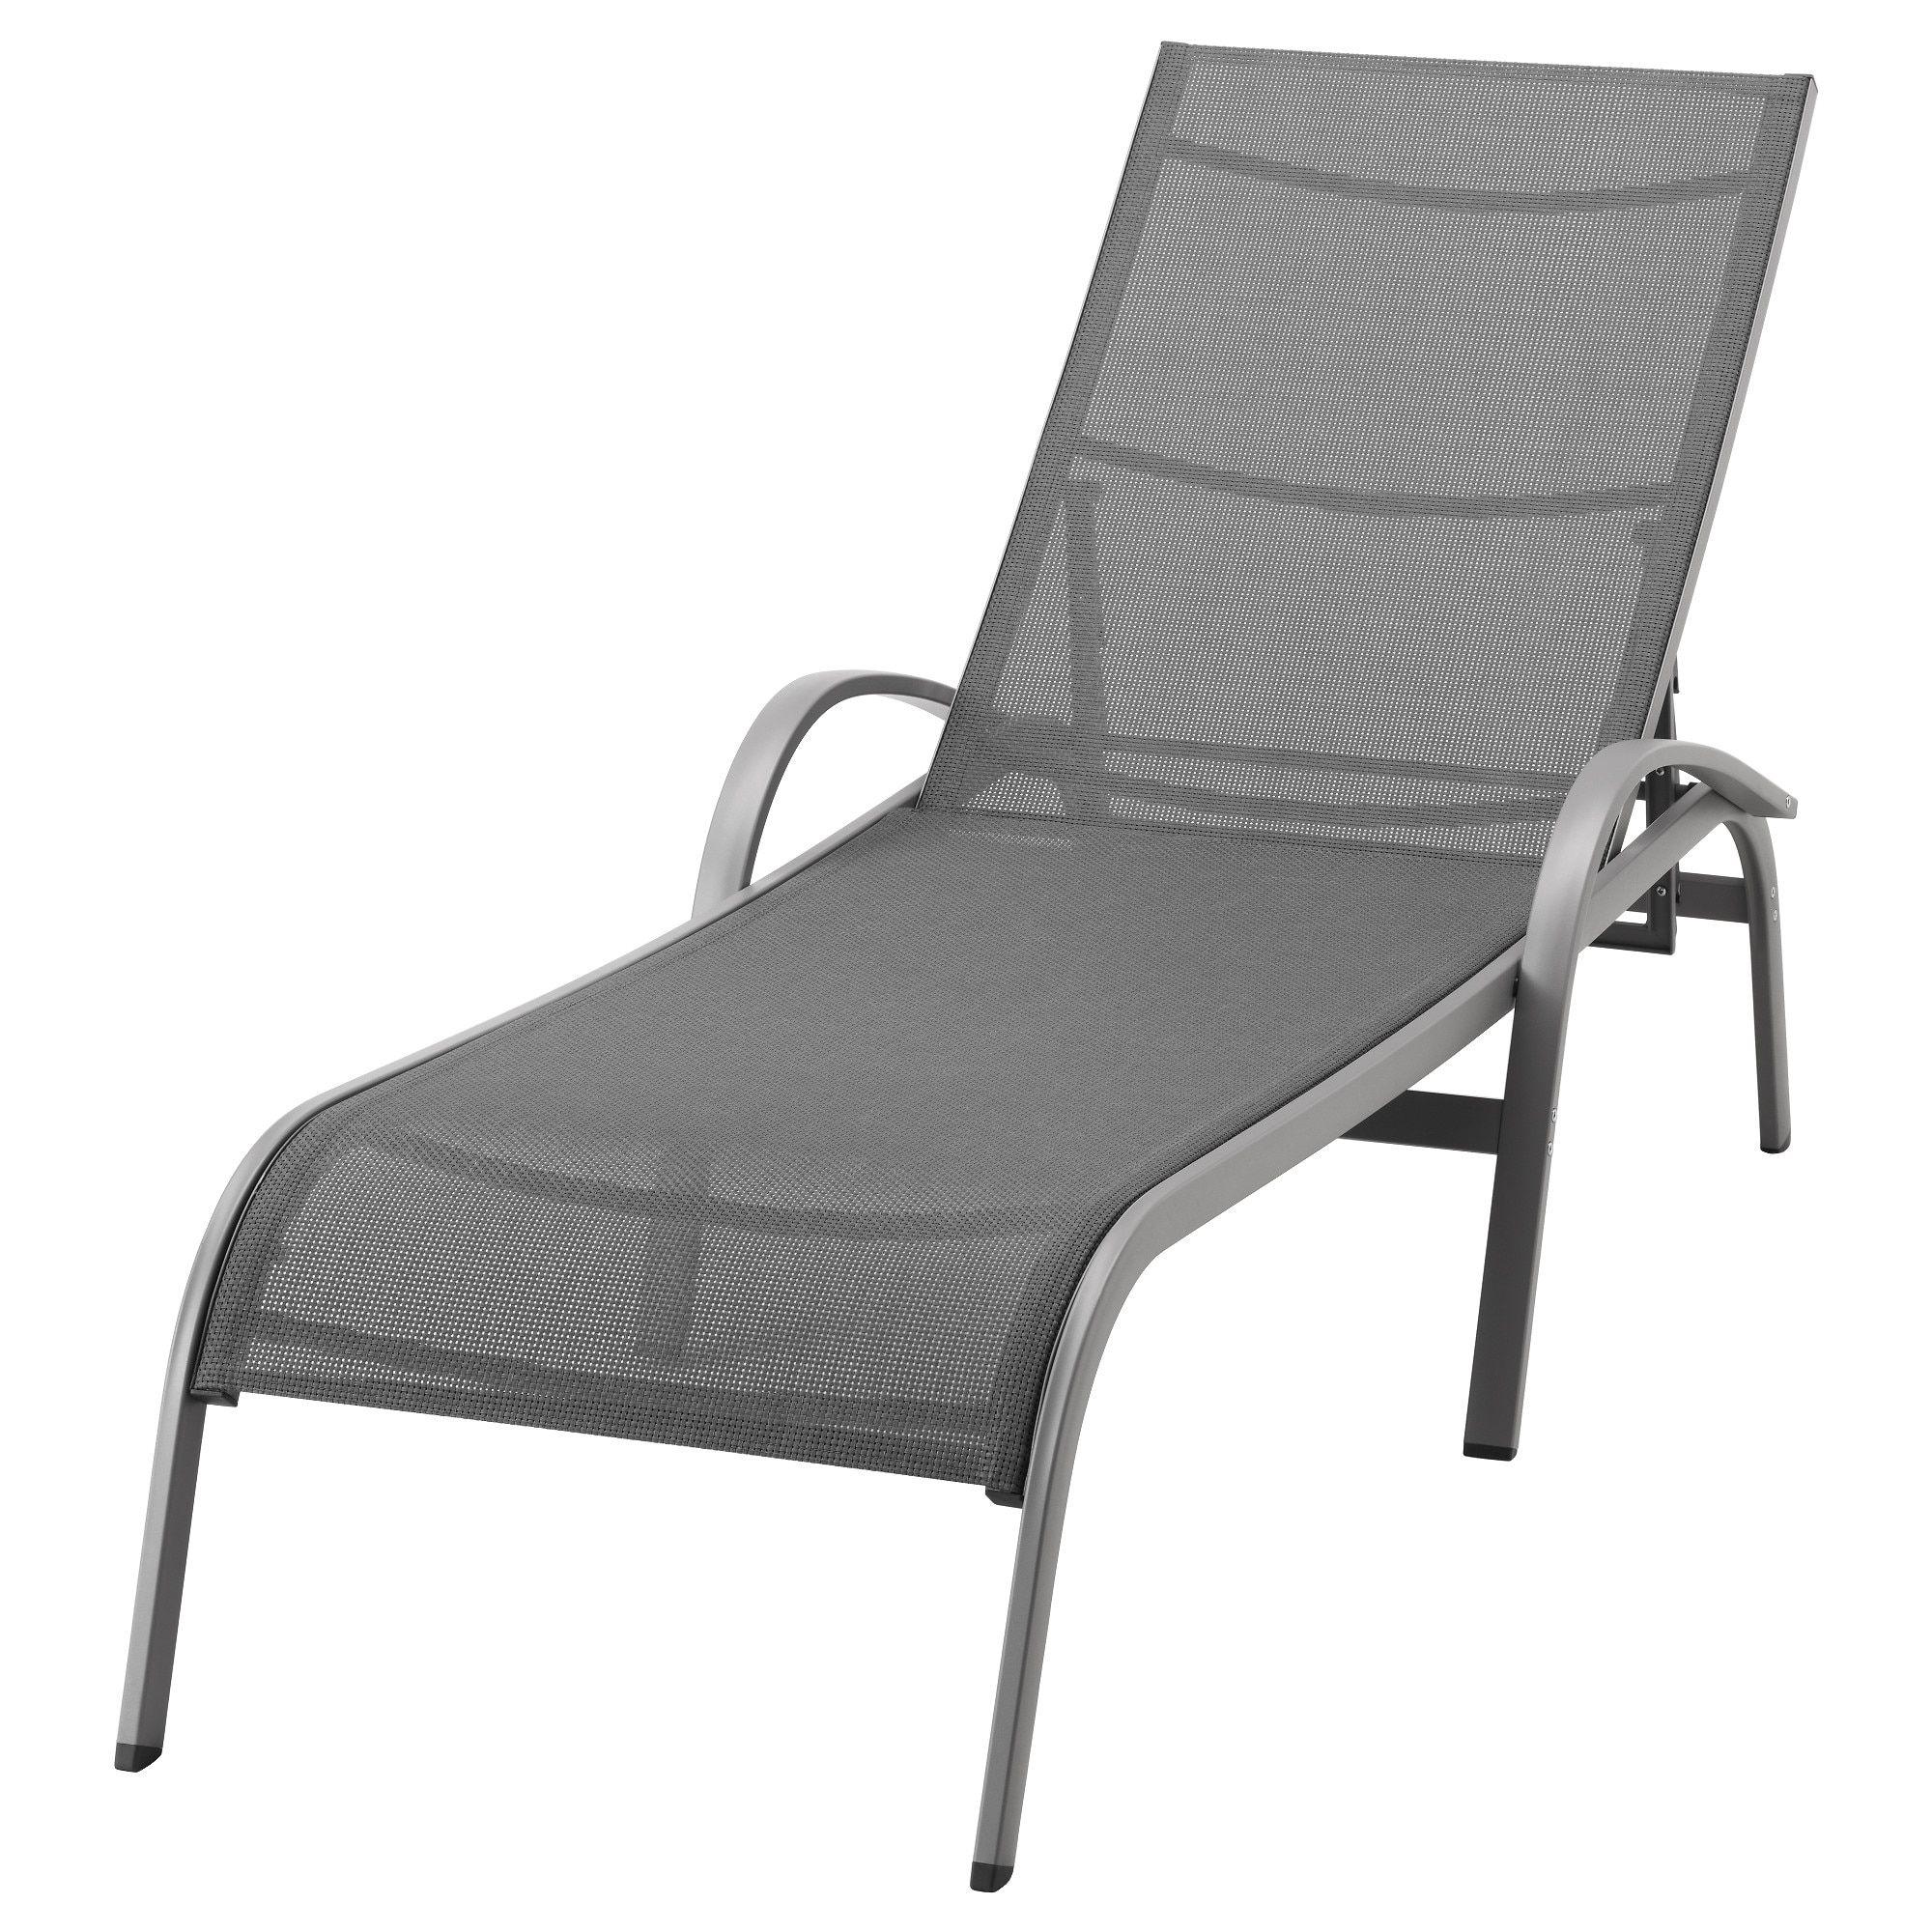 TORHOLMEN Chaise lounger gray IKEA Outdoor lounge